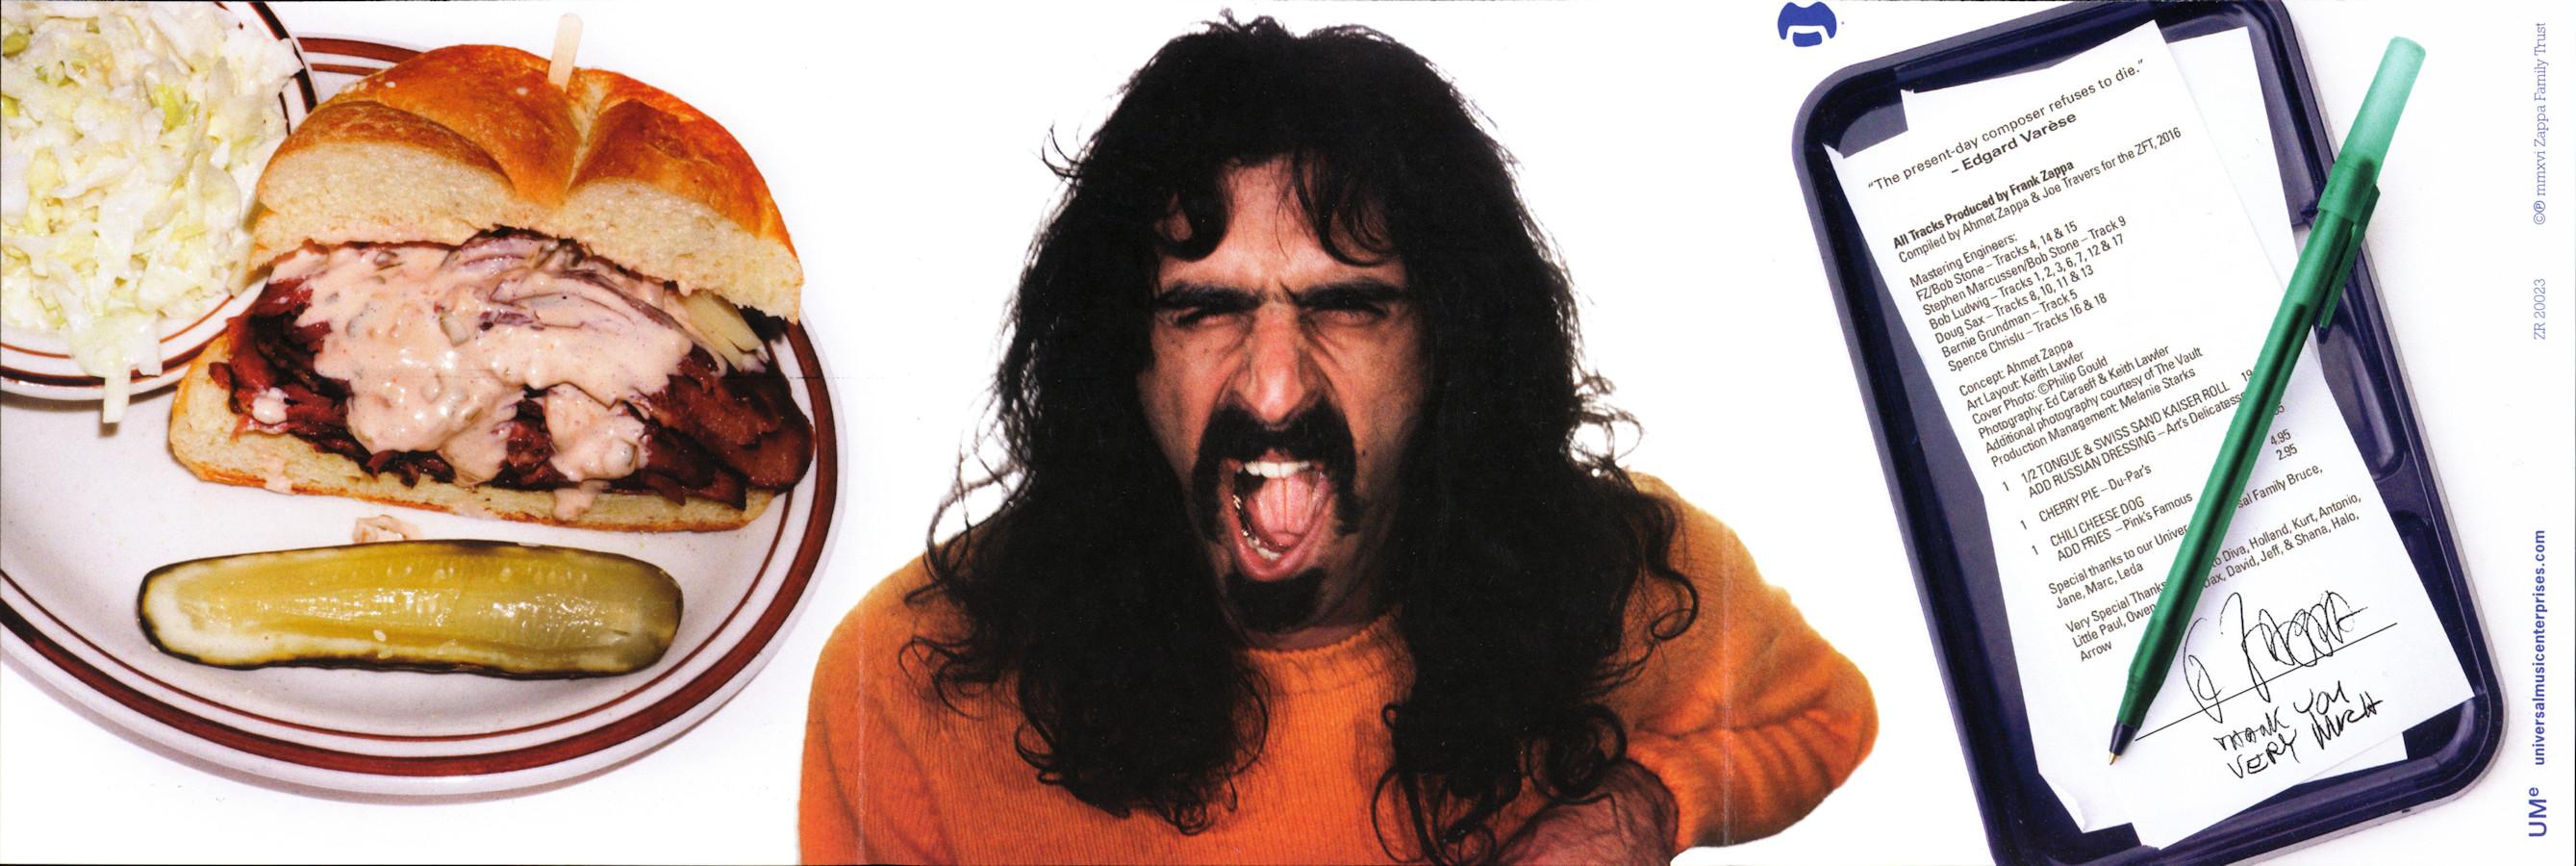 Frank Zappa Official Release 106 Zappatite Frank Zappa